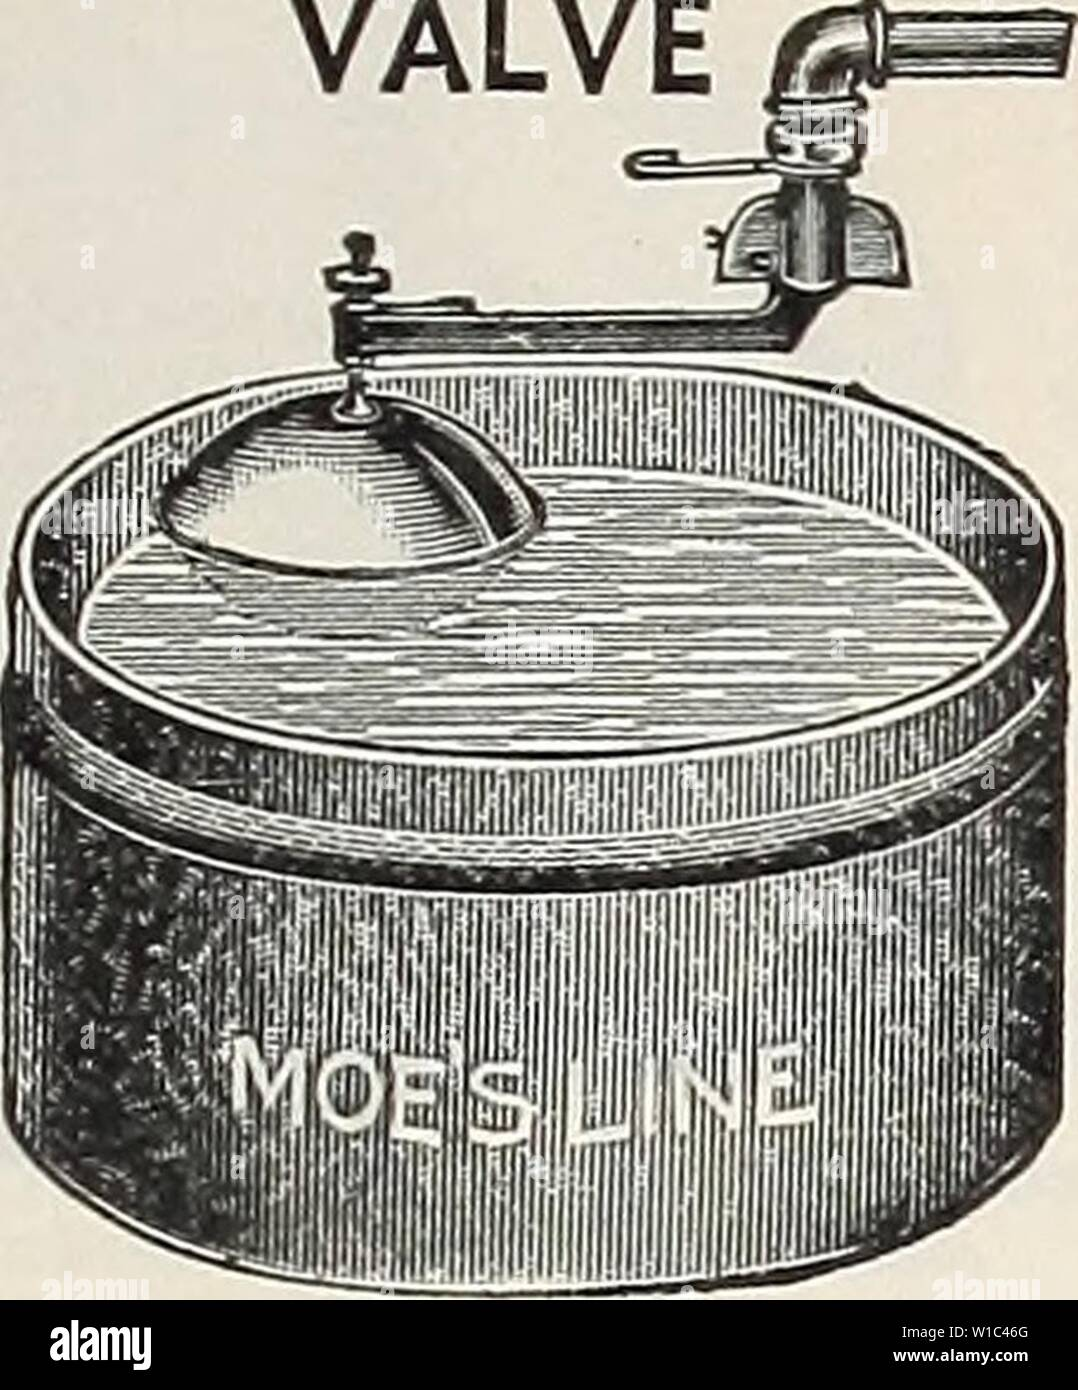 Pin Seefahrt ist Not 1935-3,5 x 3 cm